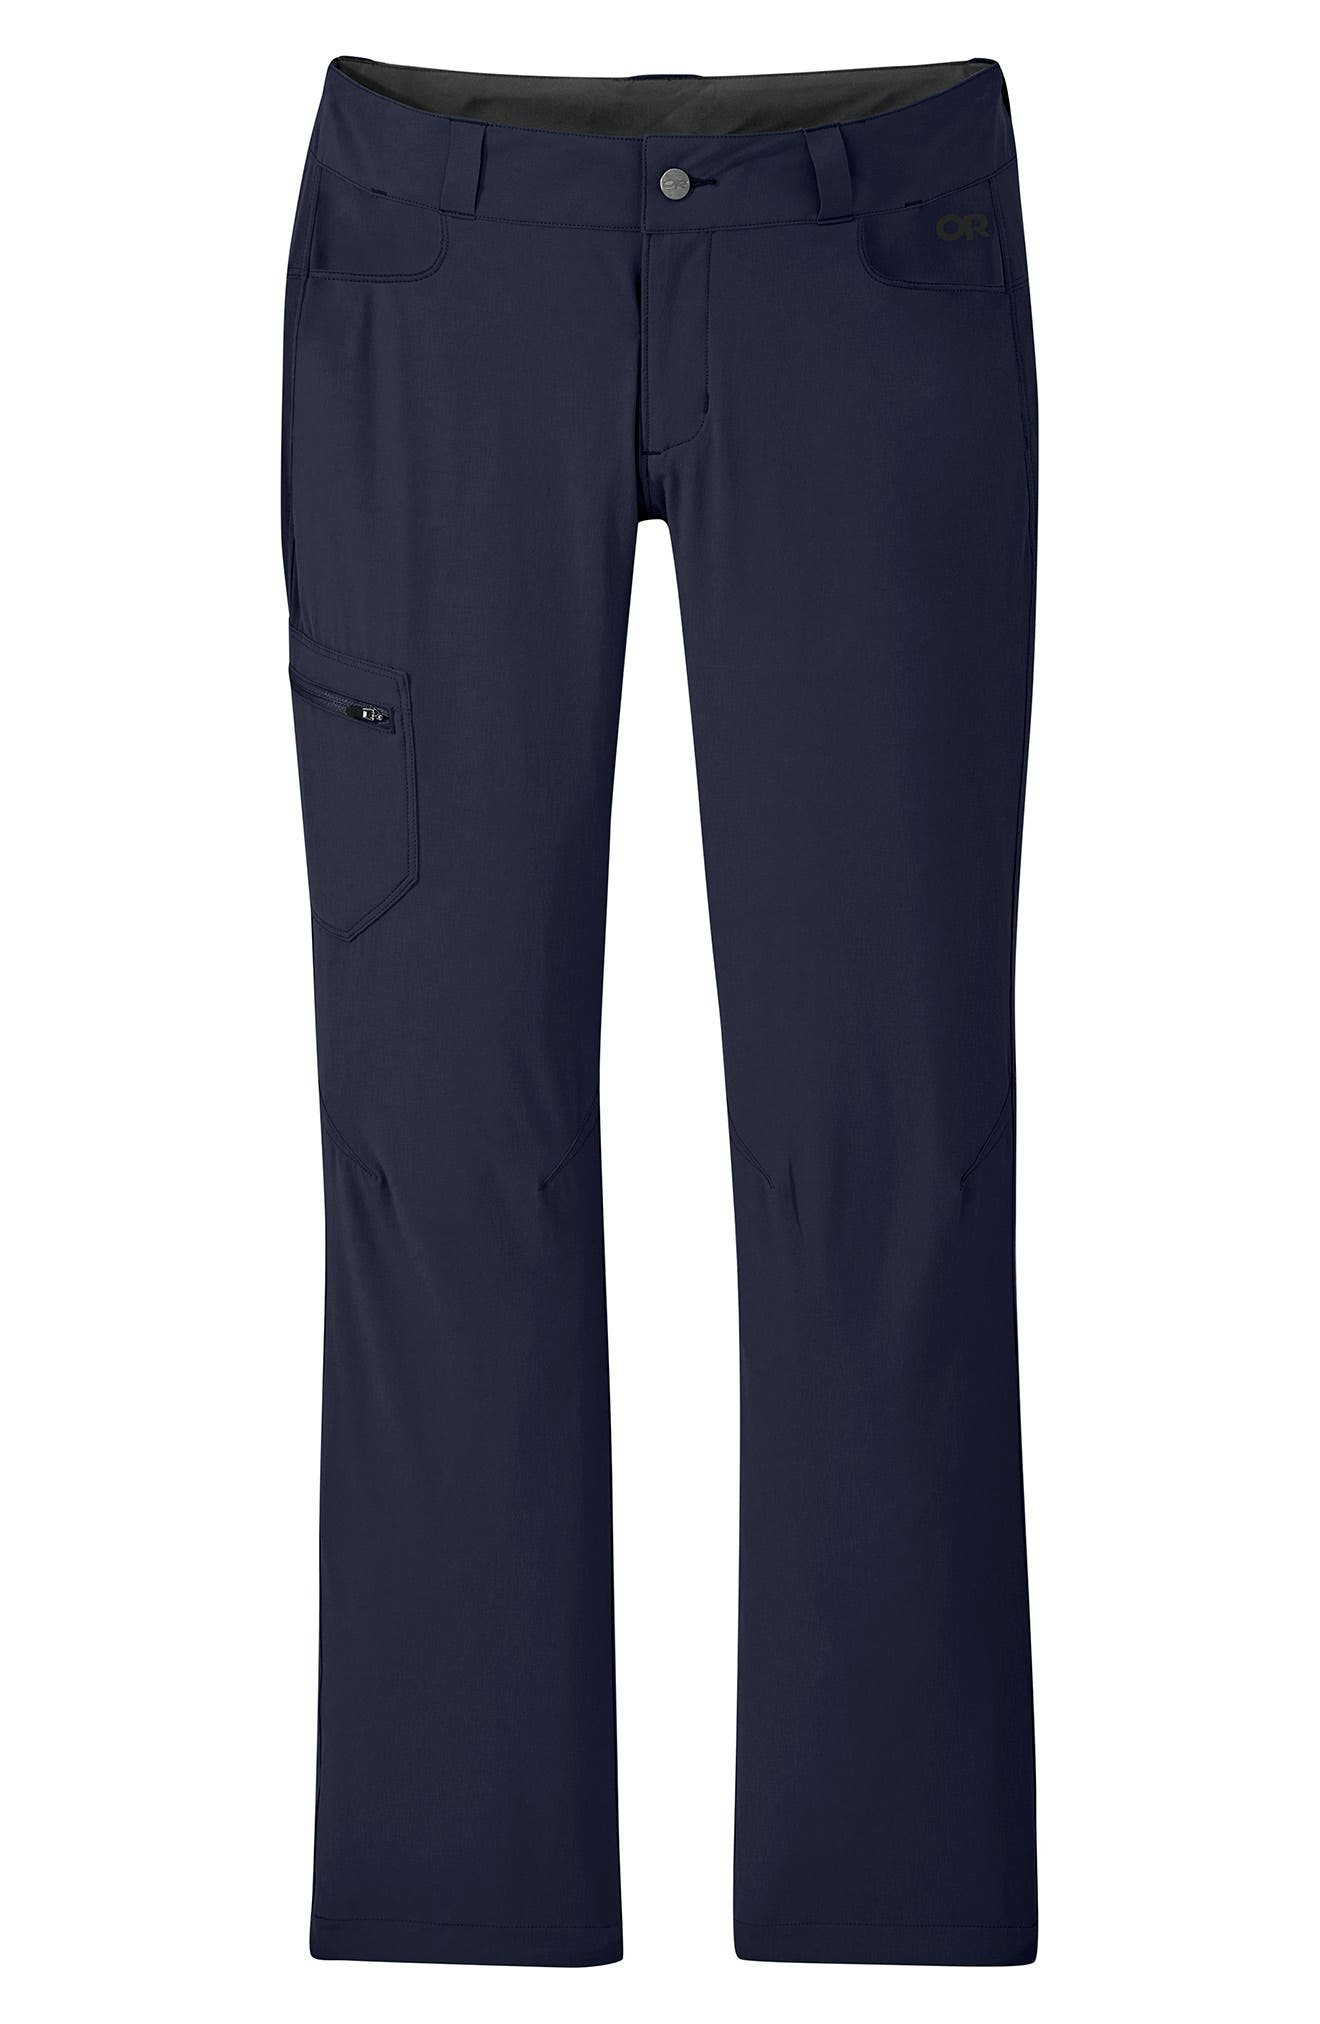 Women's Outdoor Research Ferrosi Weather Resistant Women's Performance Pants